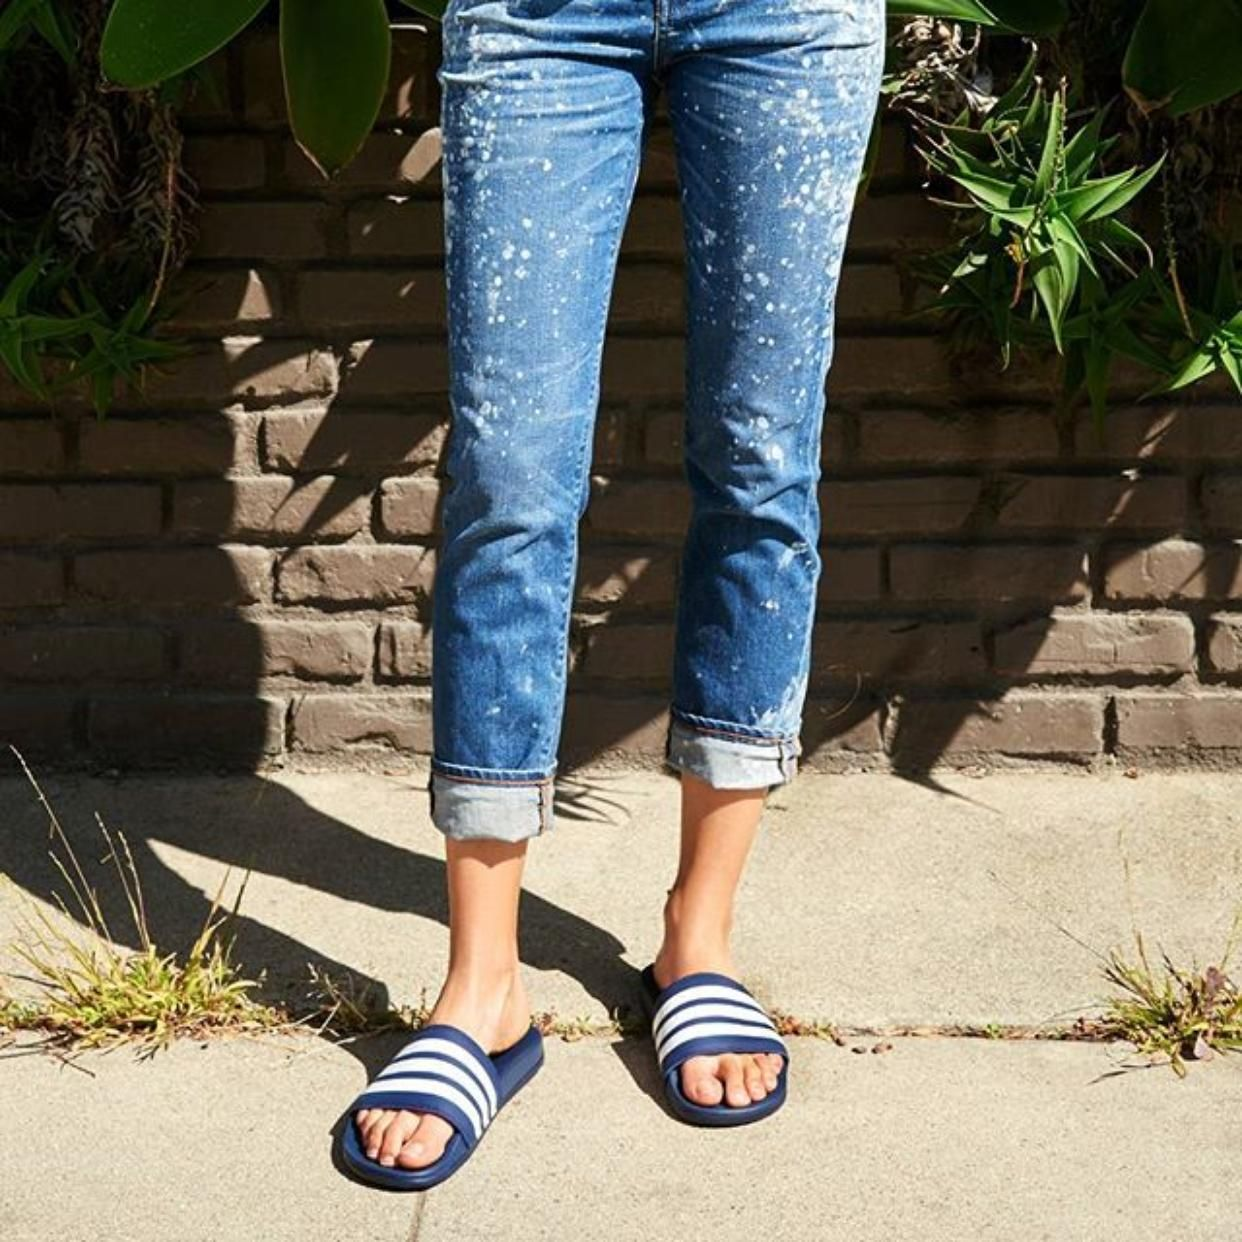 6baa2f8bff626 adidas Adilette Cloudfoam Ultra Stripes Slide Sandal